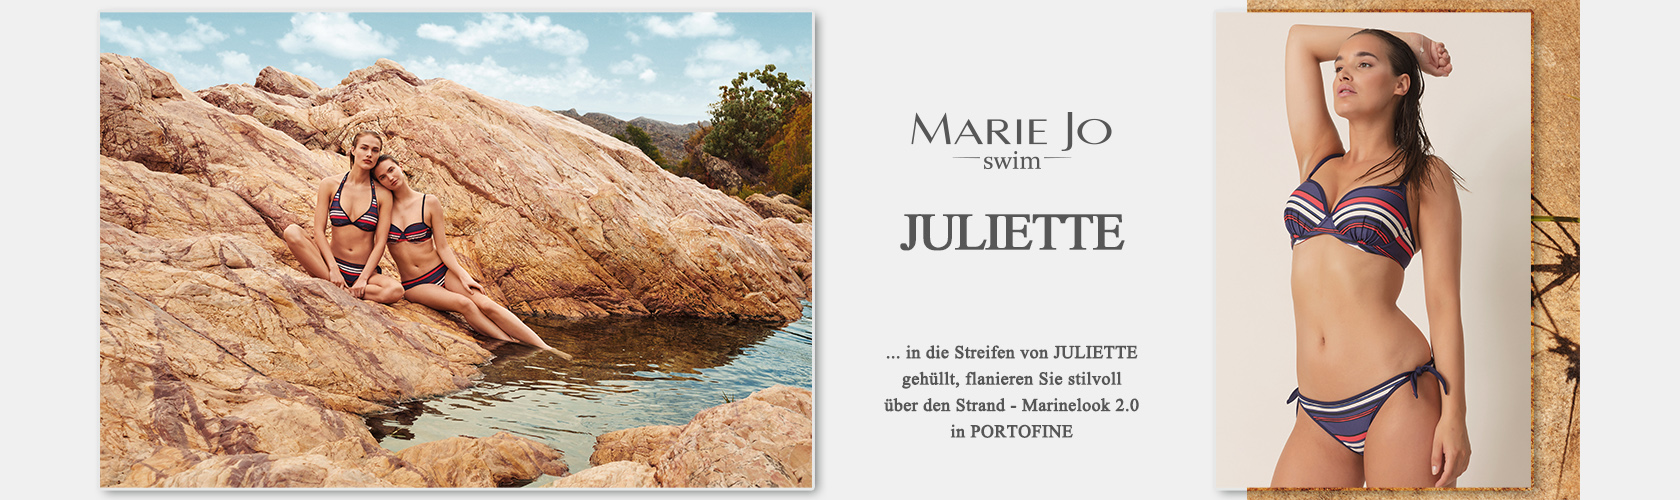 Slideshow JULIETTE PTF 27.03.